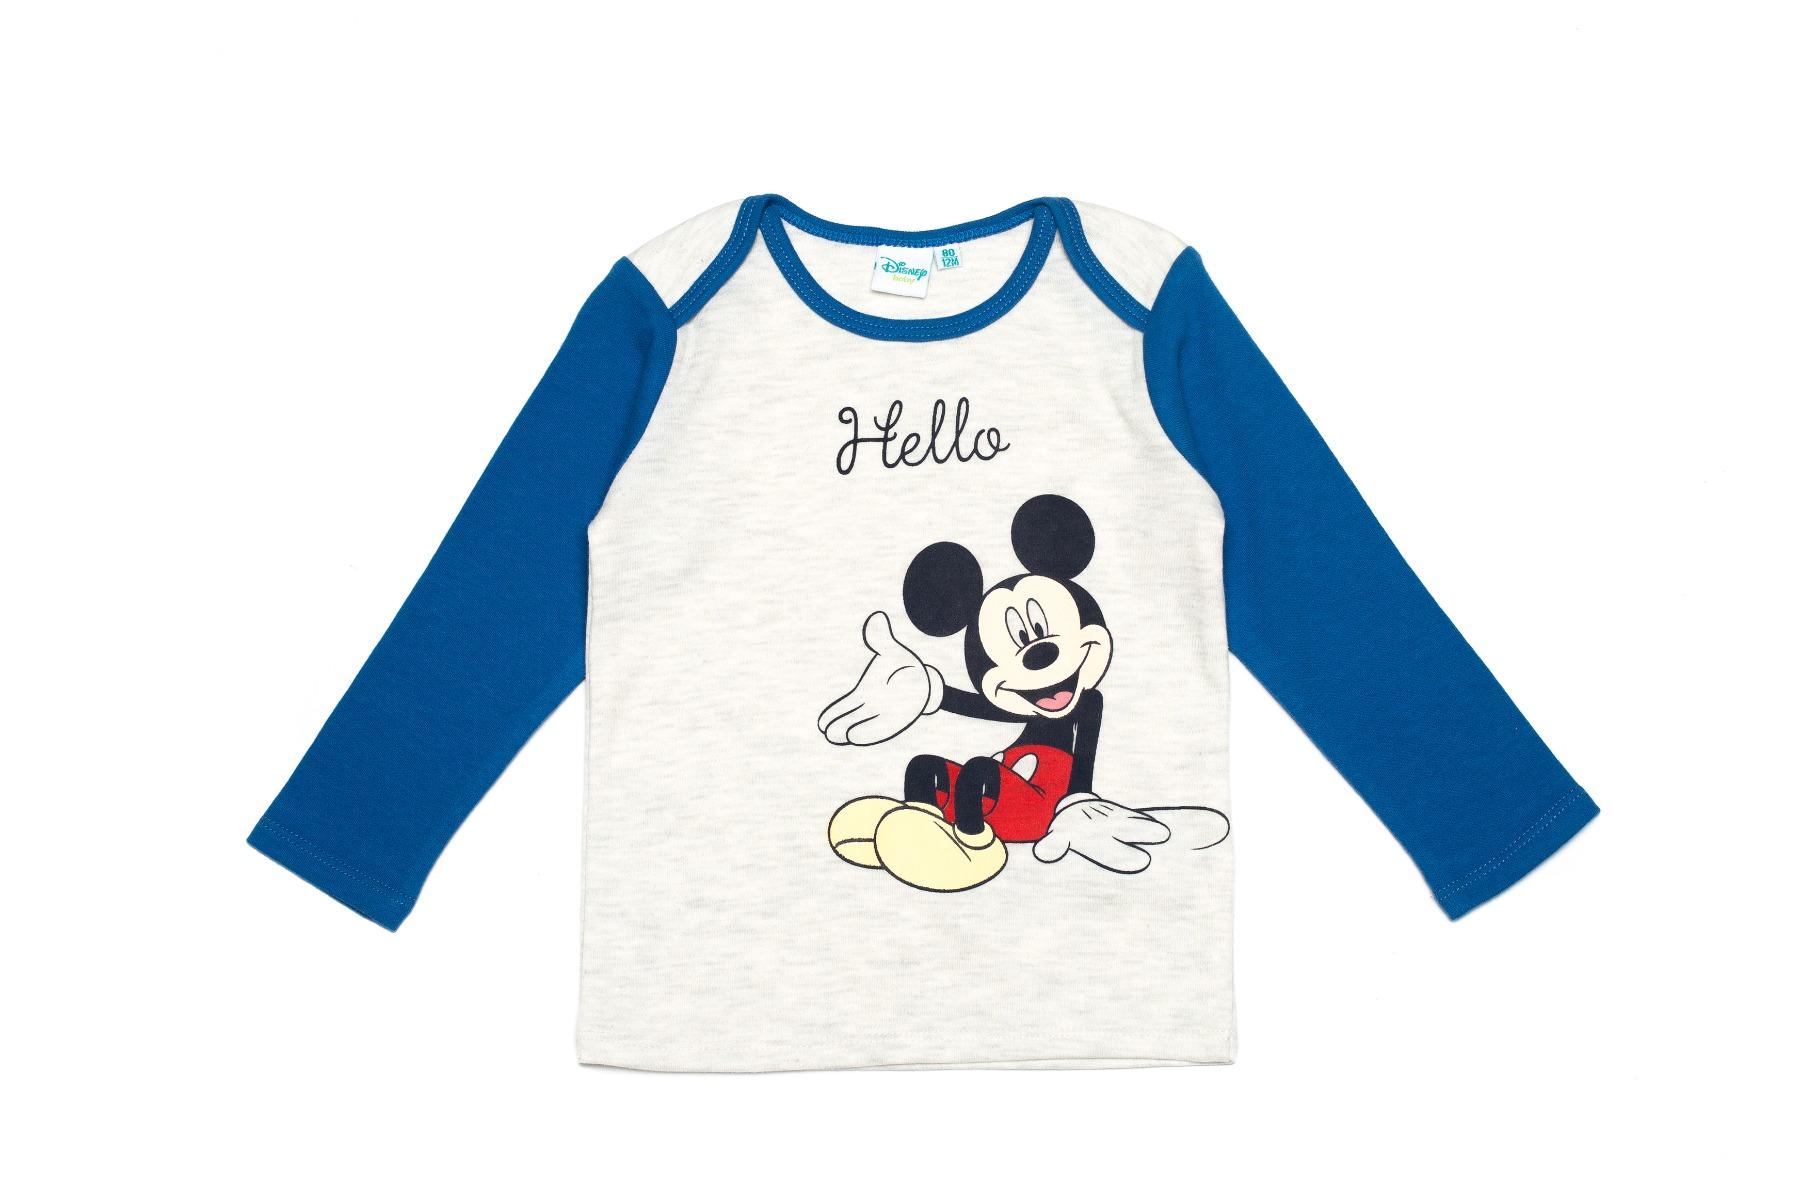 Tricou cu maneca lunga si imprimeu Disney Mickey Mouse, Hello, Albastru